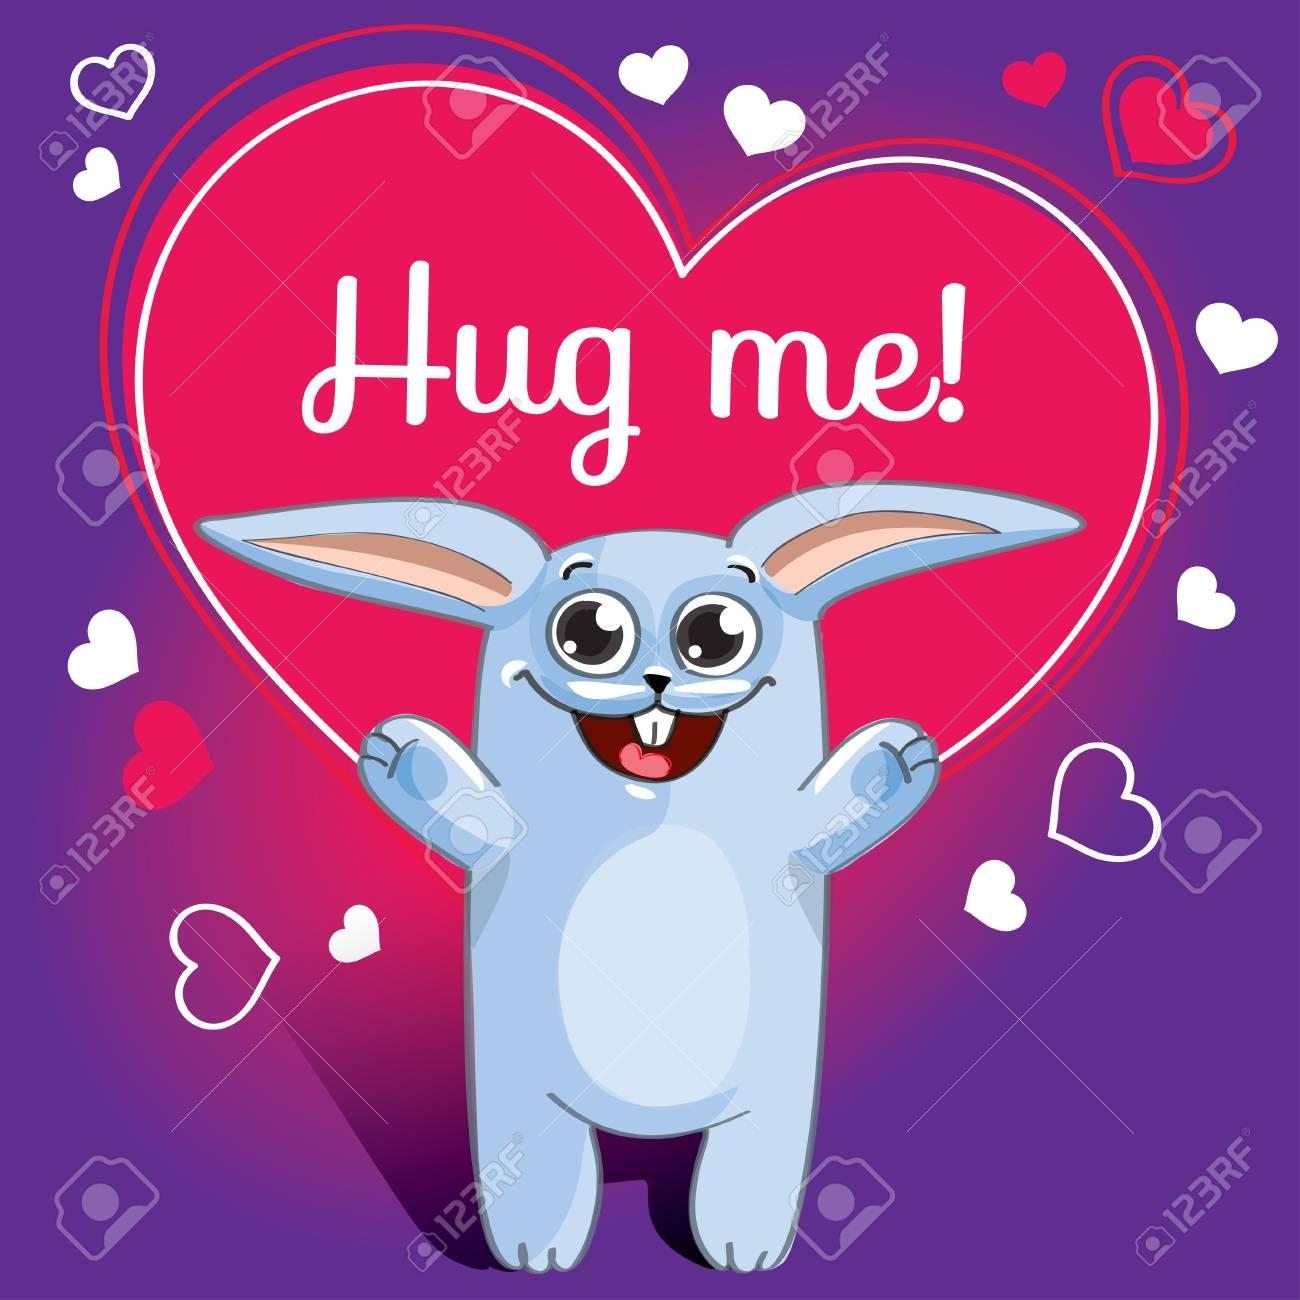 Cartoon rabbit ready for a hugging - 90576600